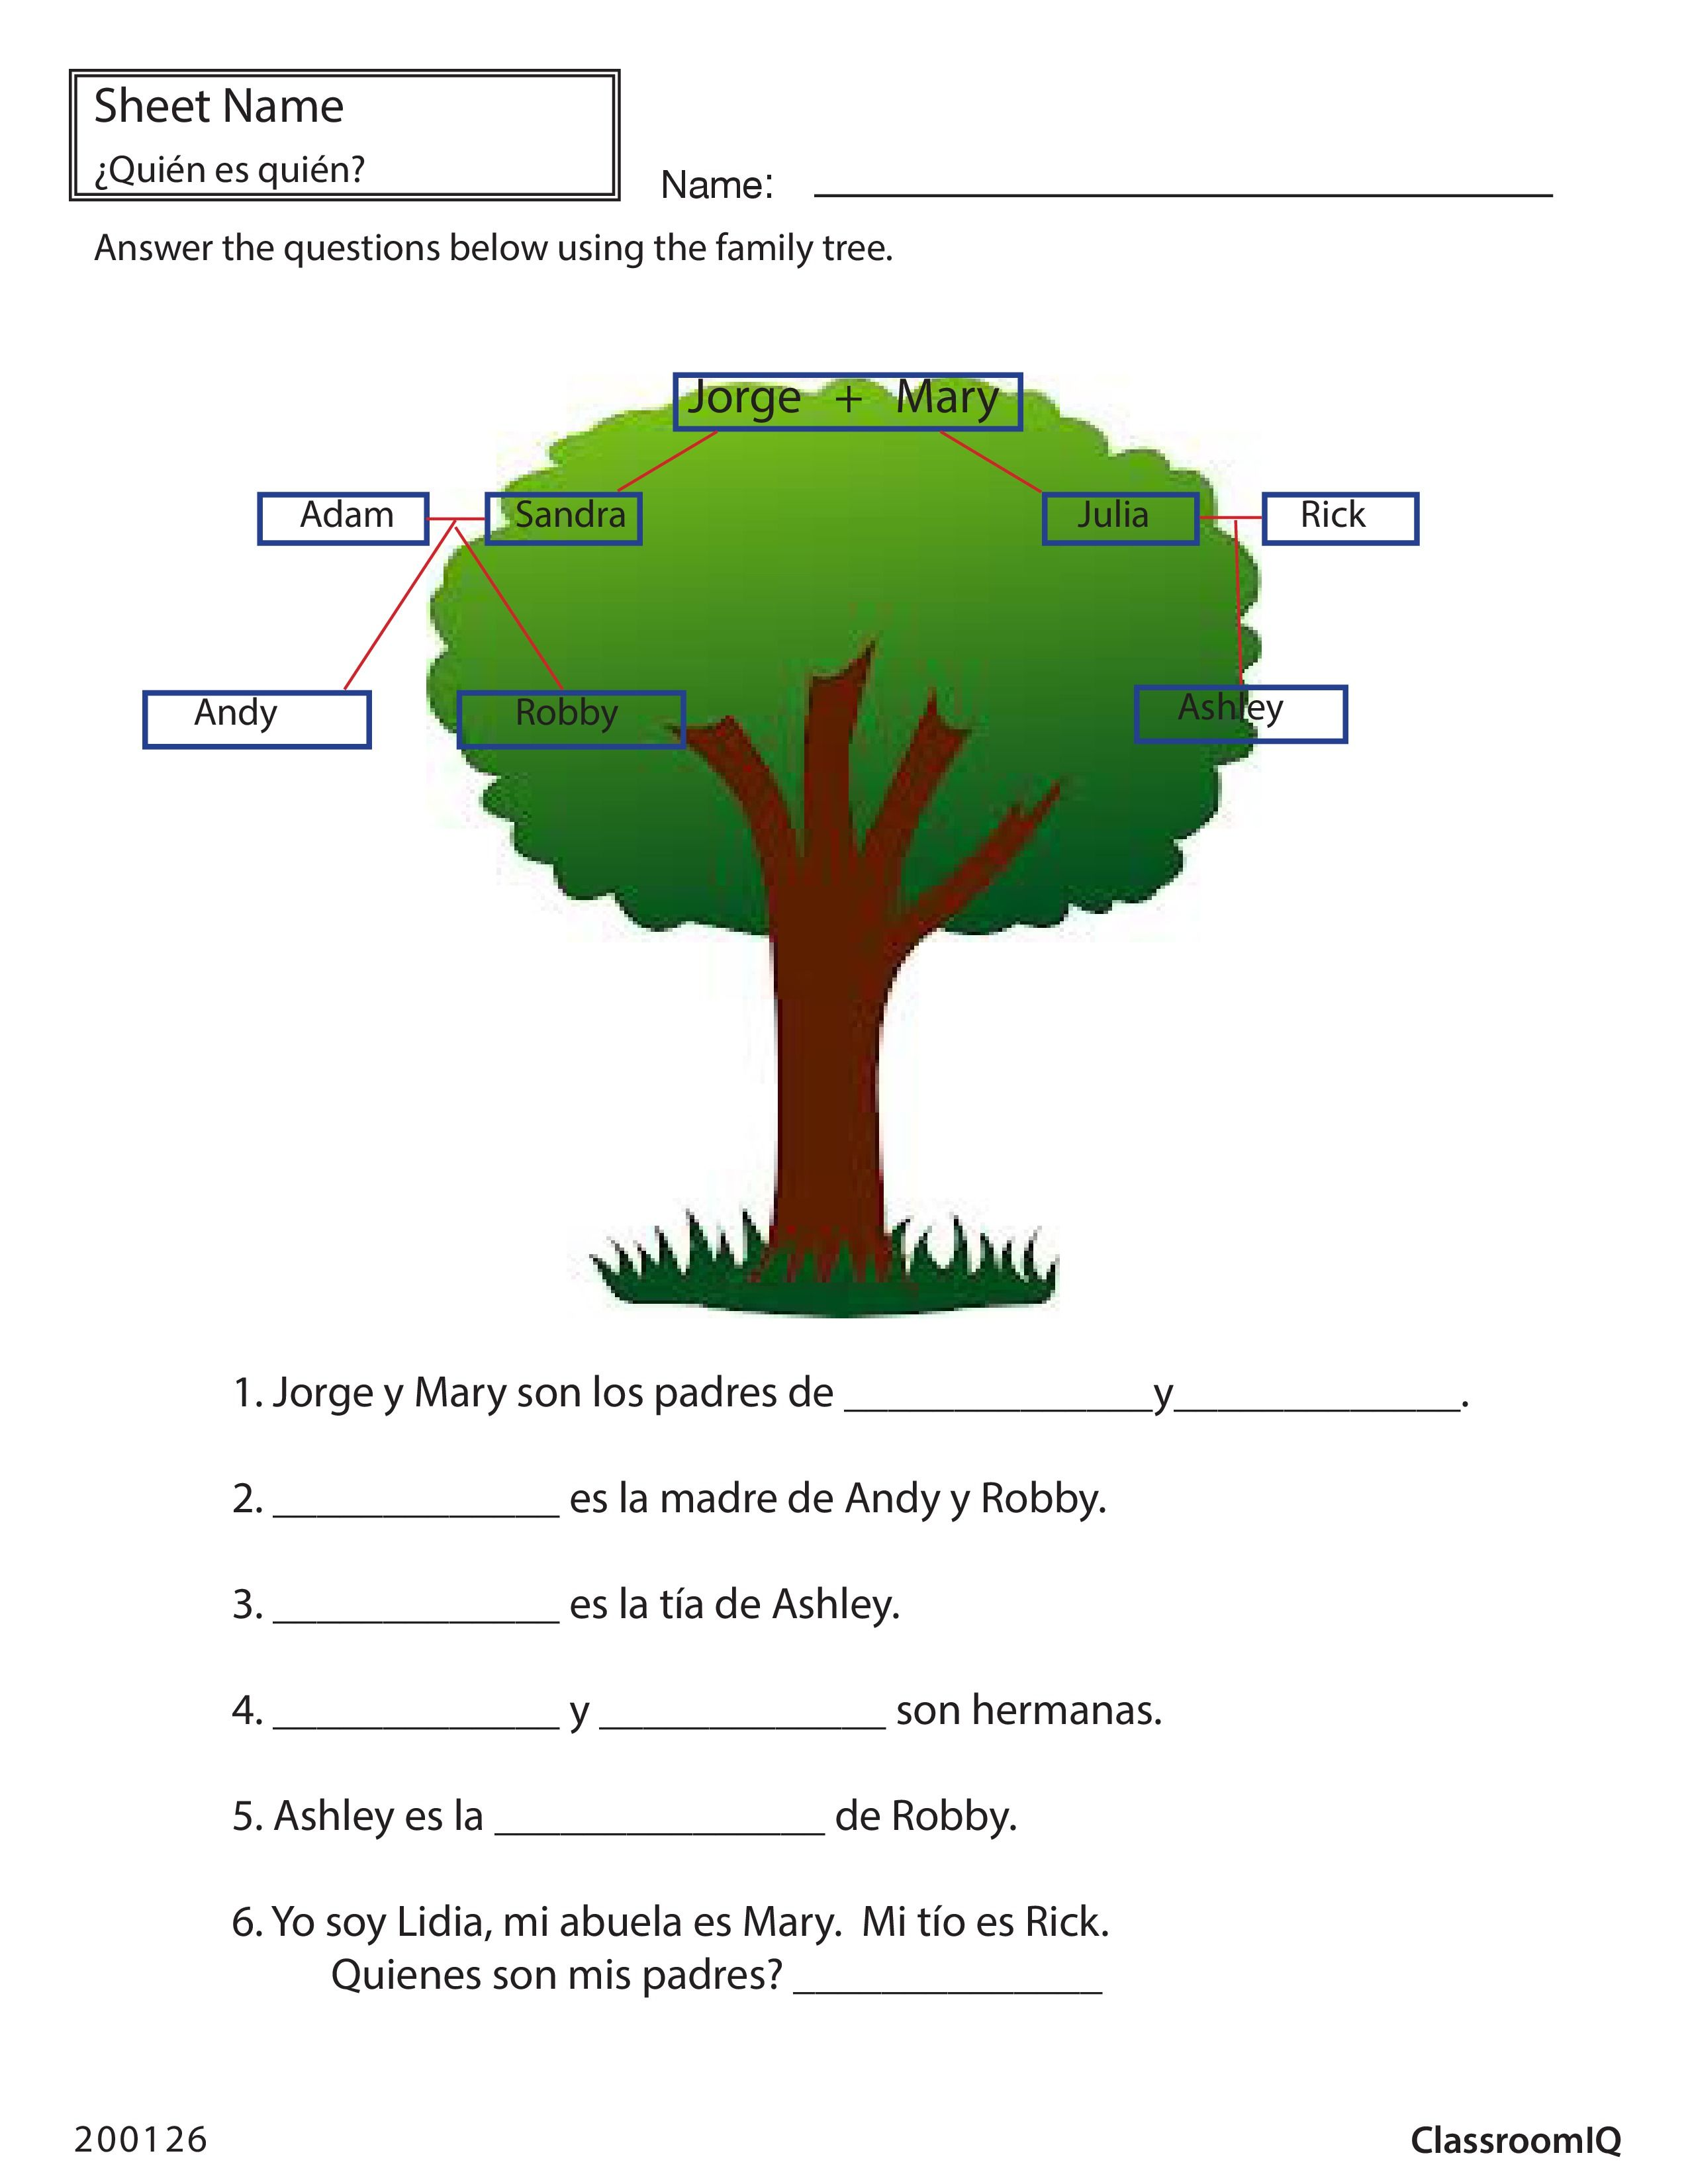 Spanish Family Tree Spanishworksheets Classroomiq Newteachers